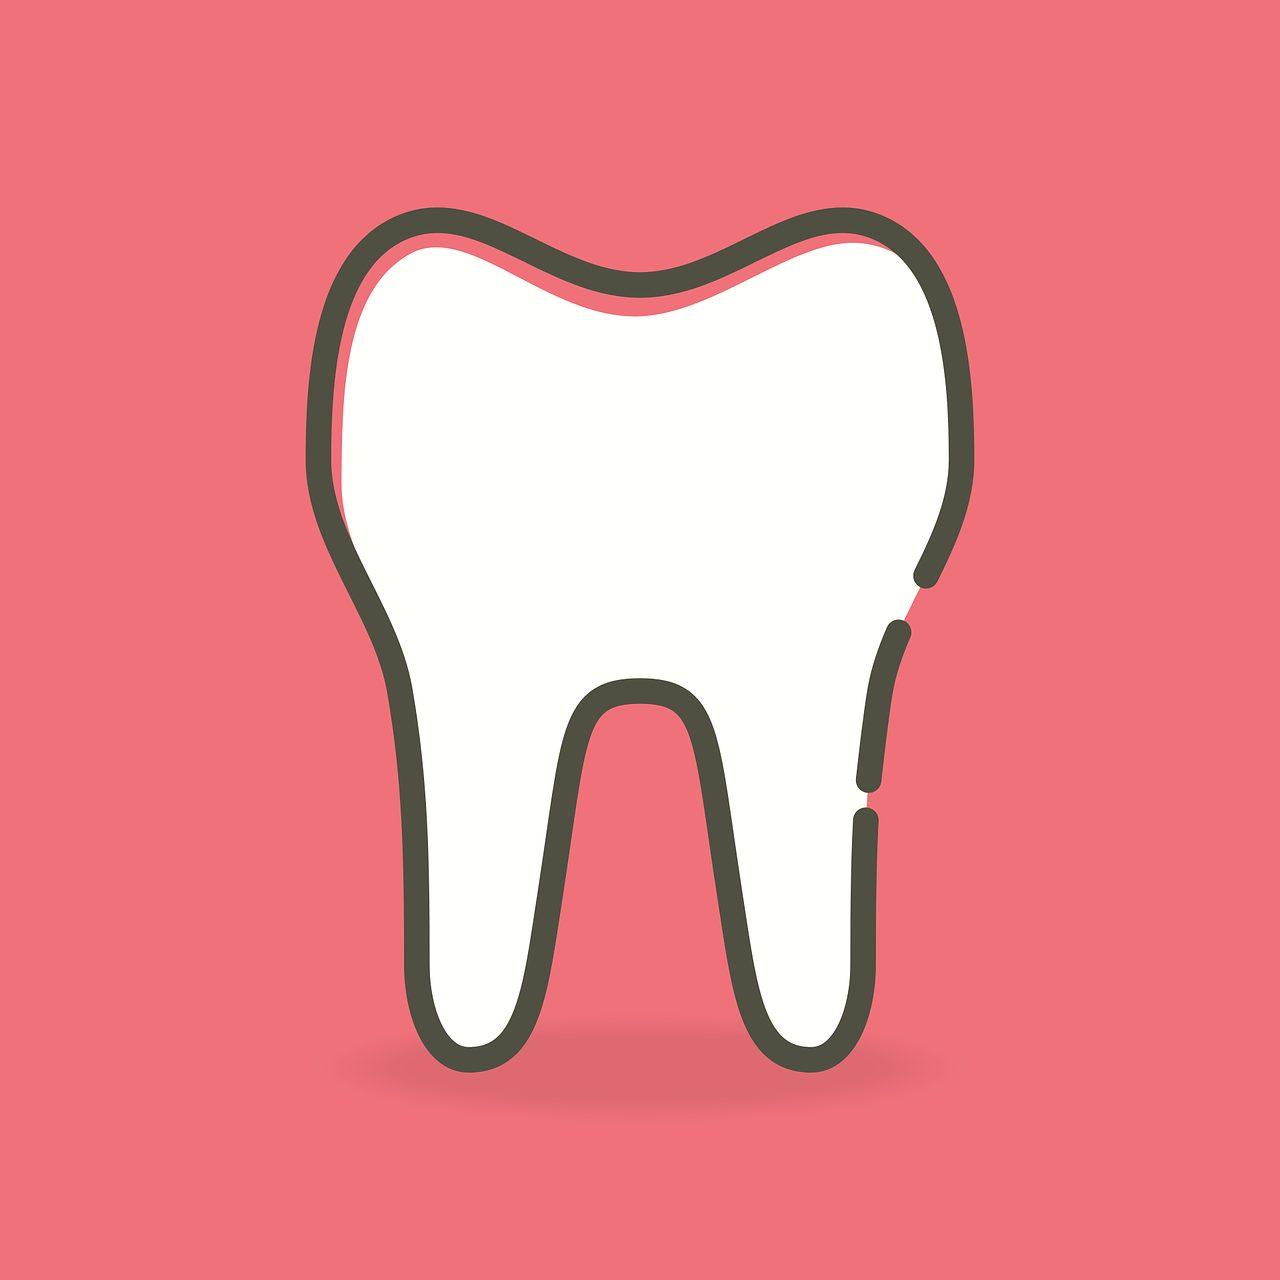 Heezen Tandartspraktijk J G tandarts spoed